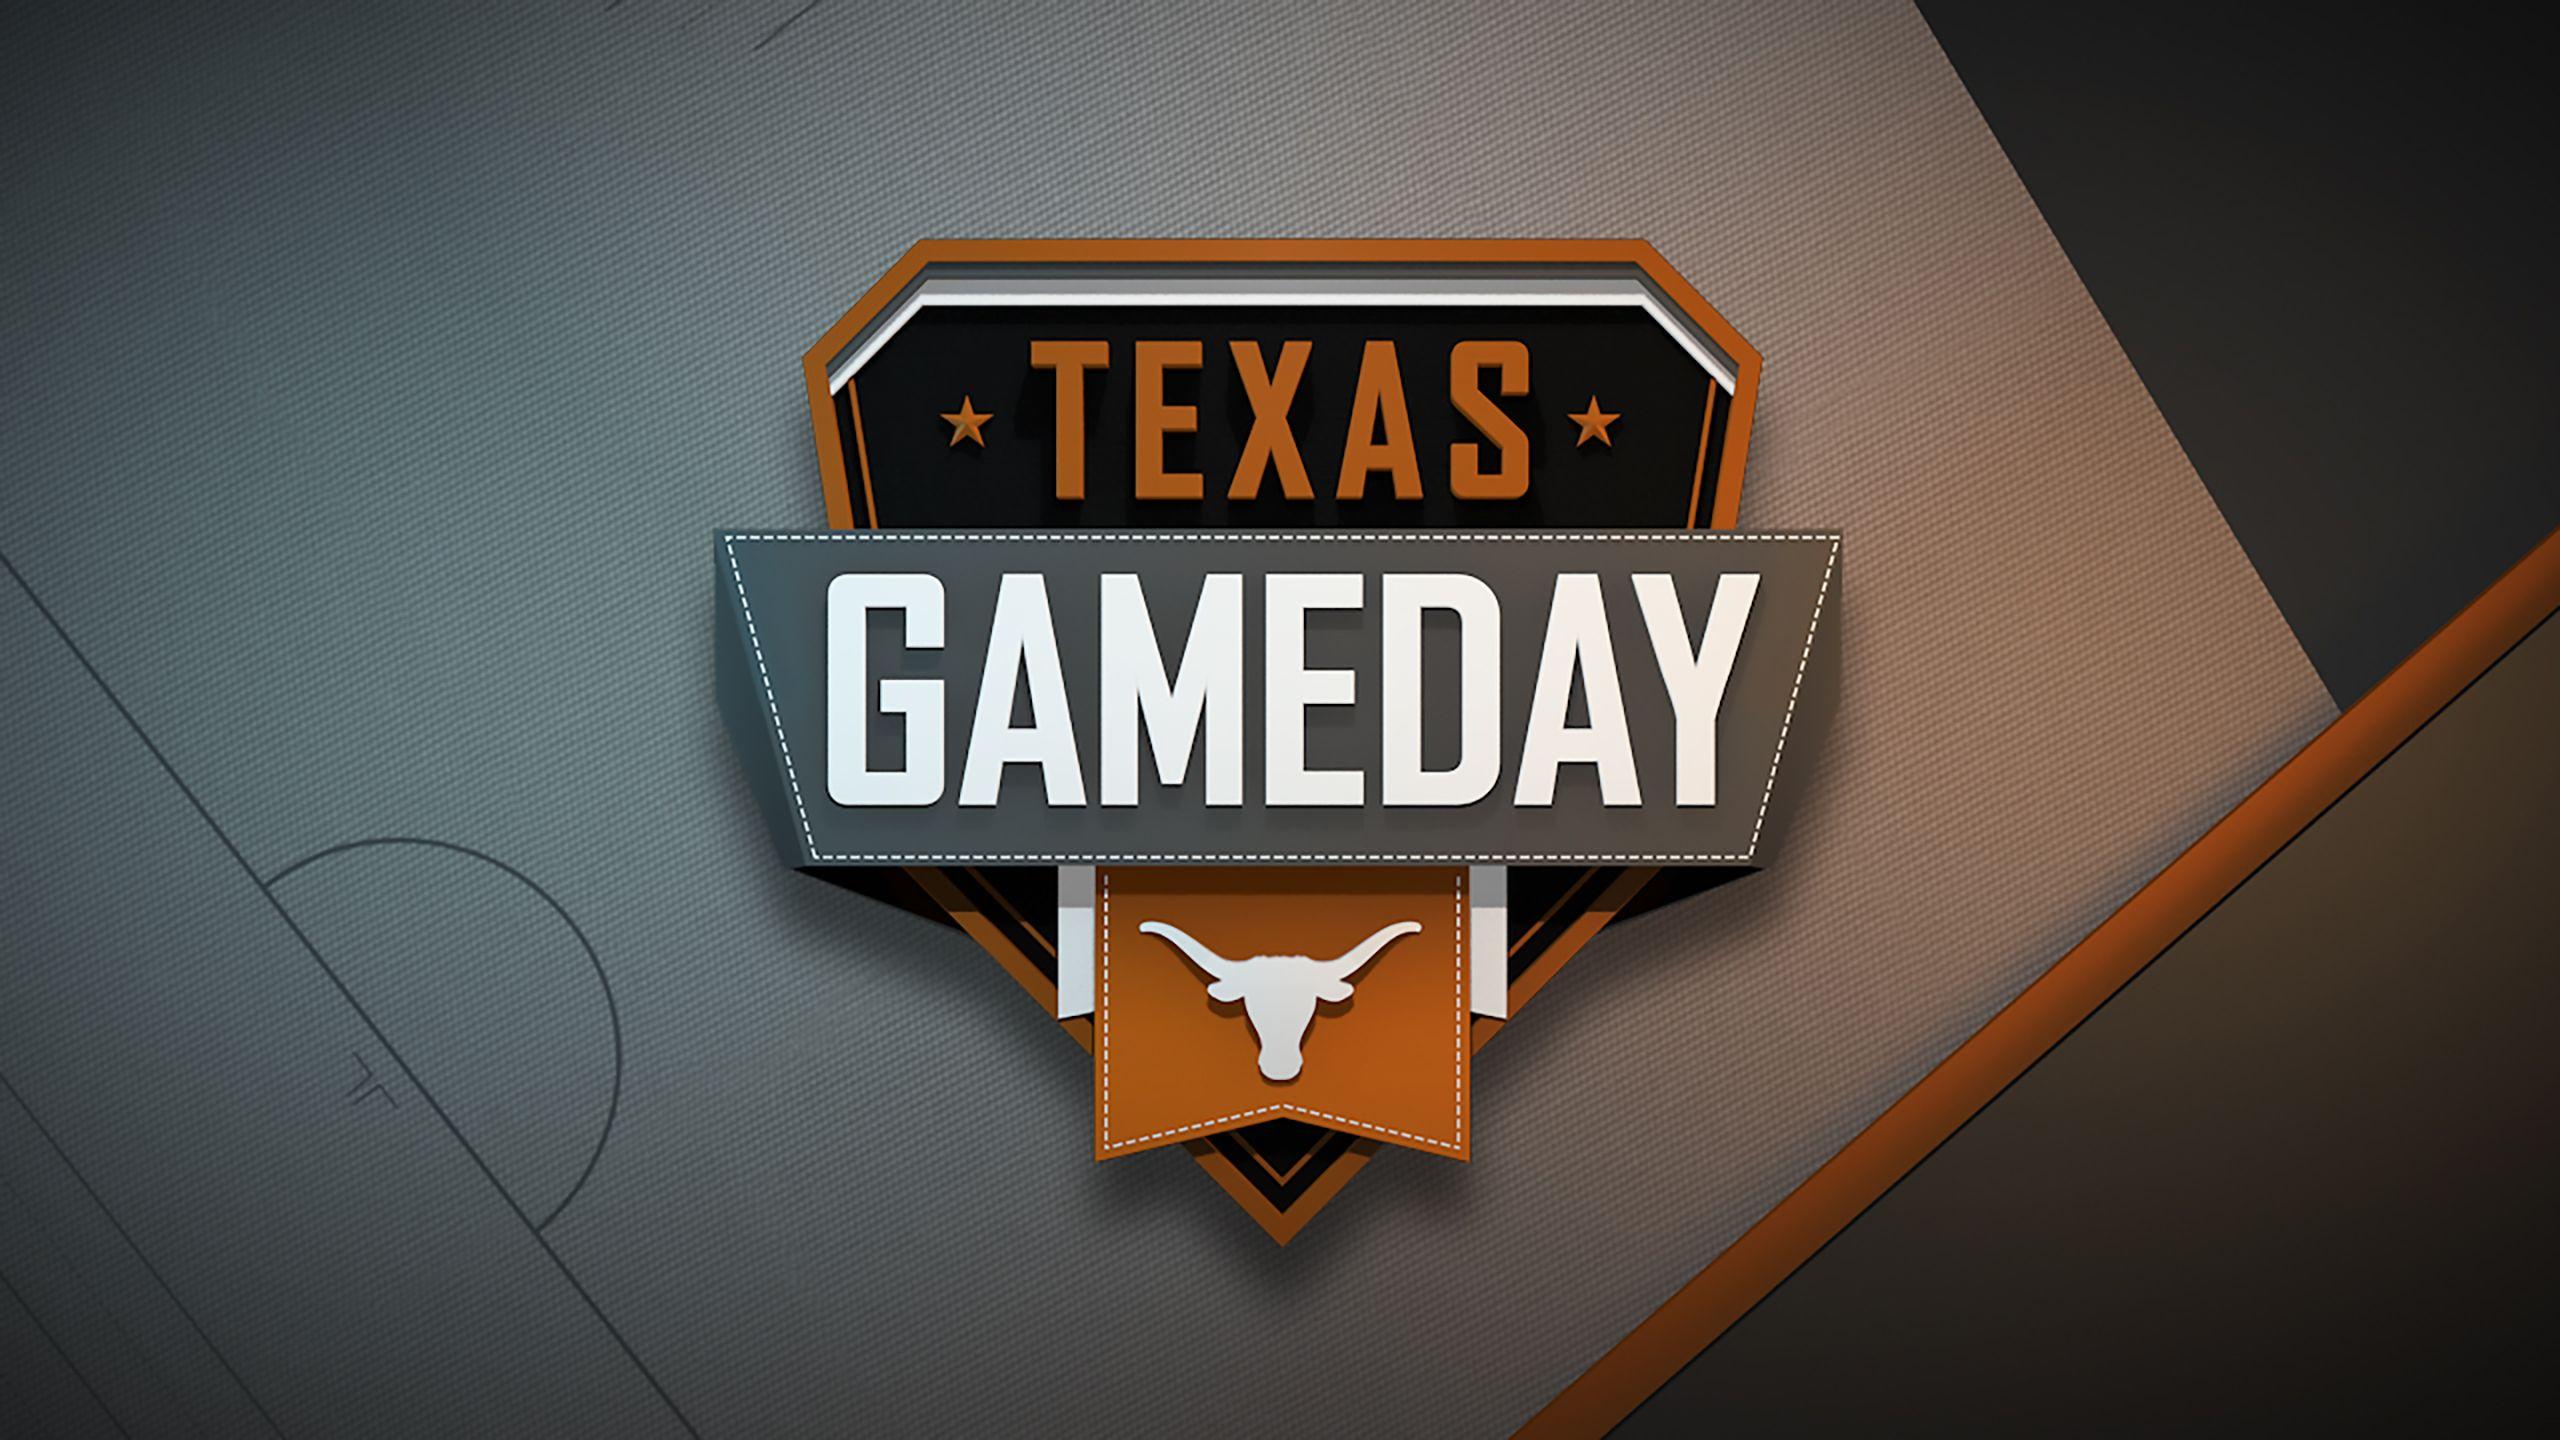 Texas GameDay